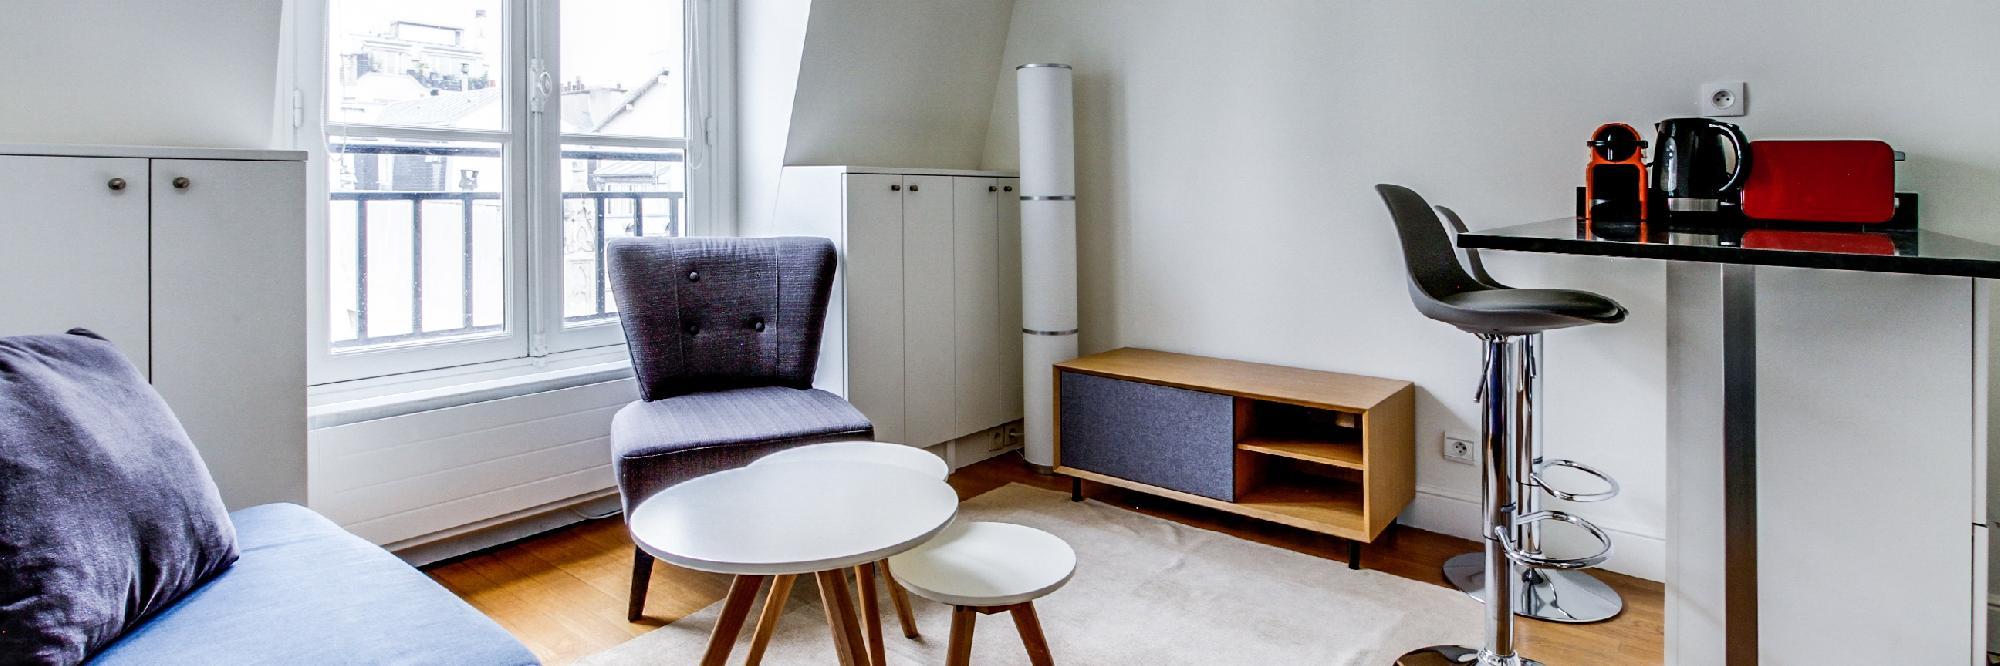 Saint Germain Des Pres – Madame Studio